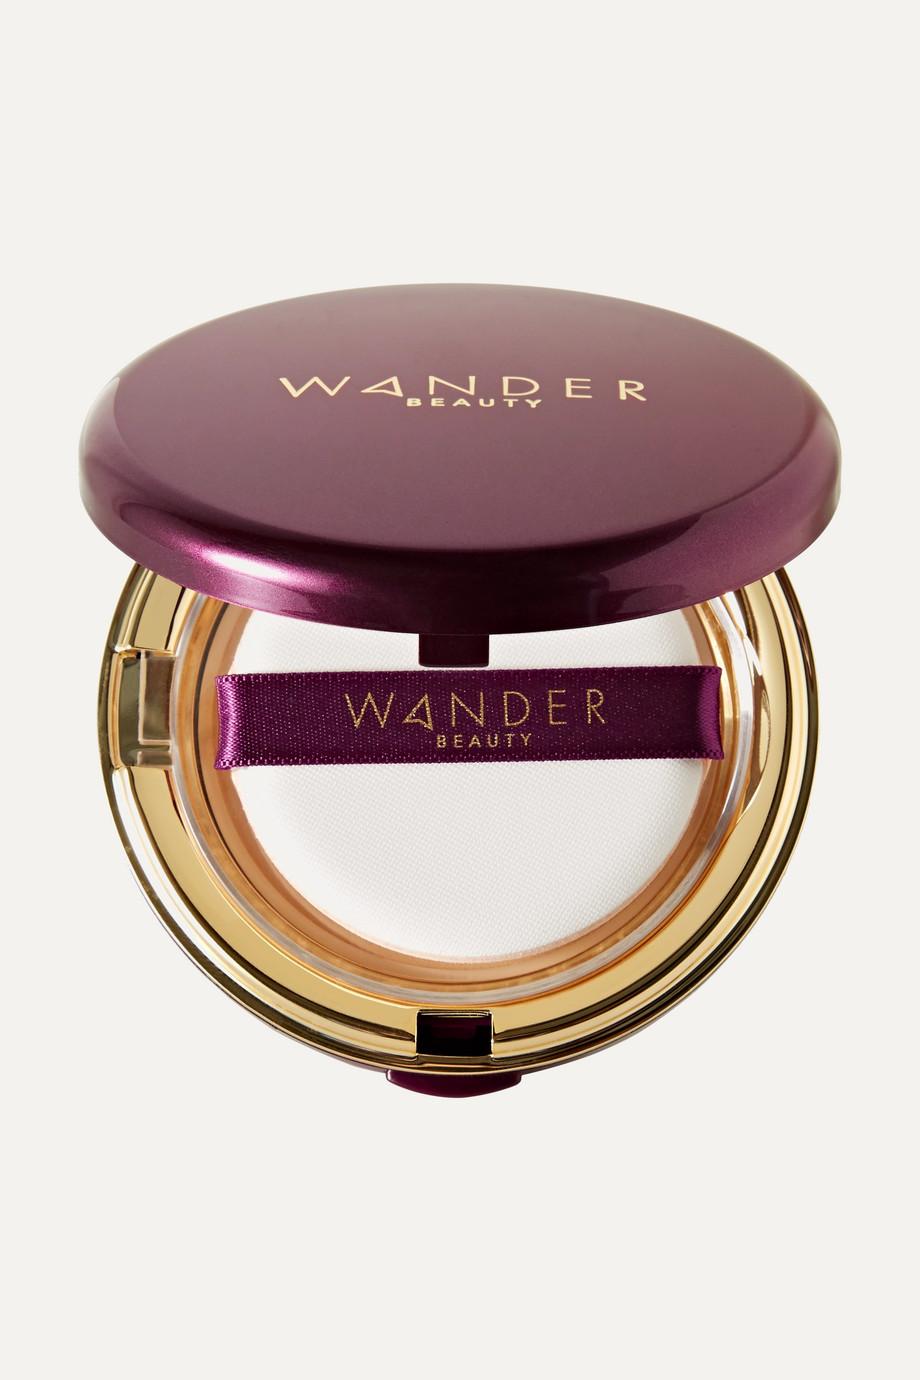 Wander Beauty Wanderlust Powder Foundation – Golden Tan – Puder-Foundation